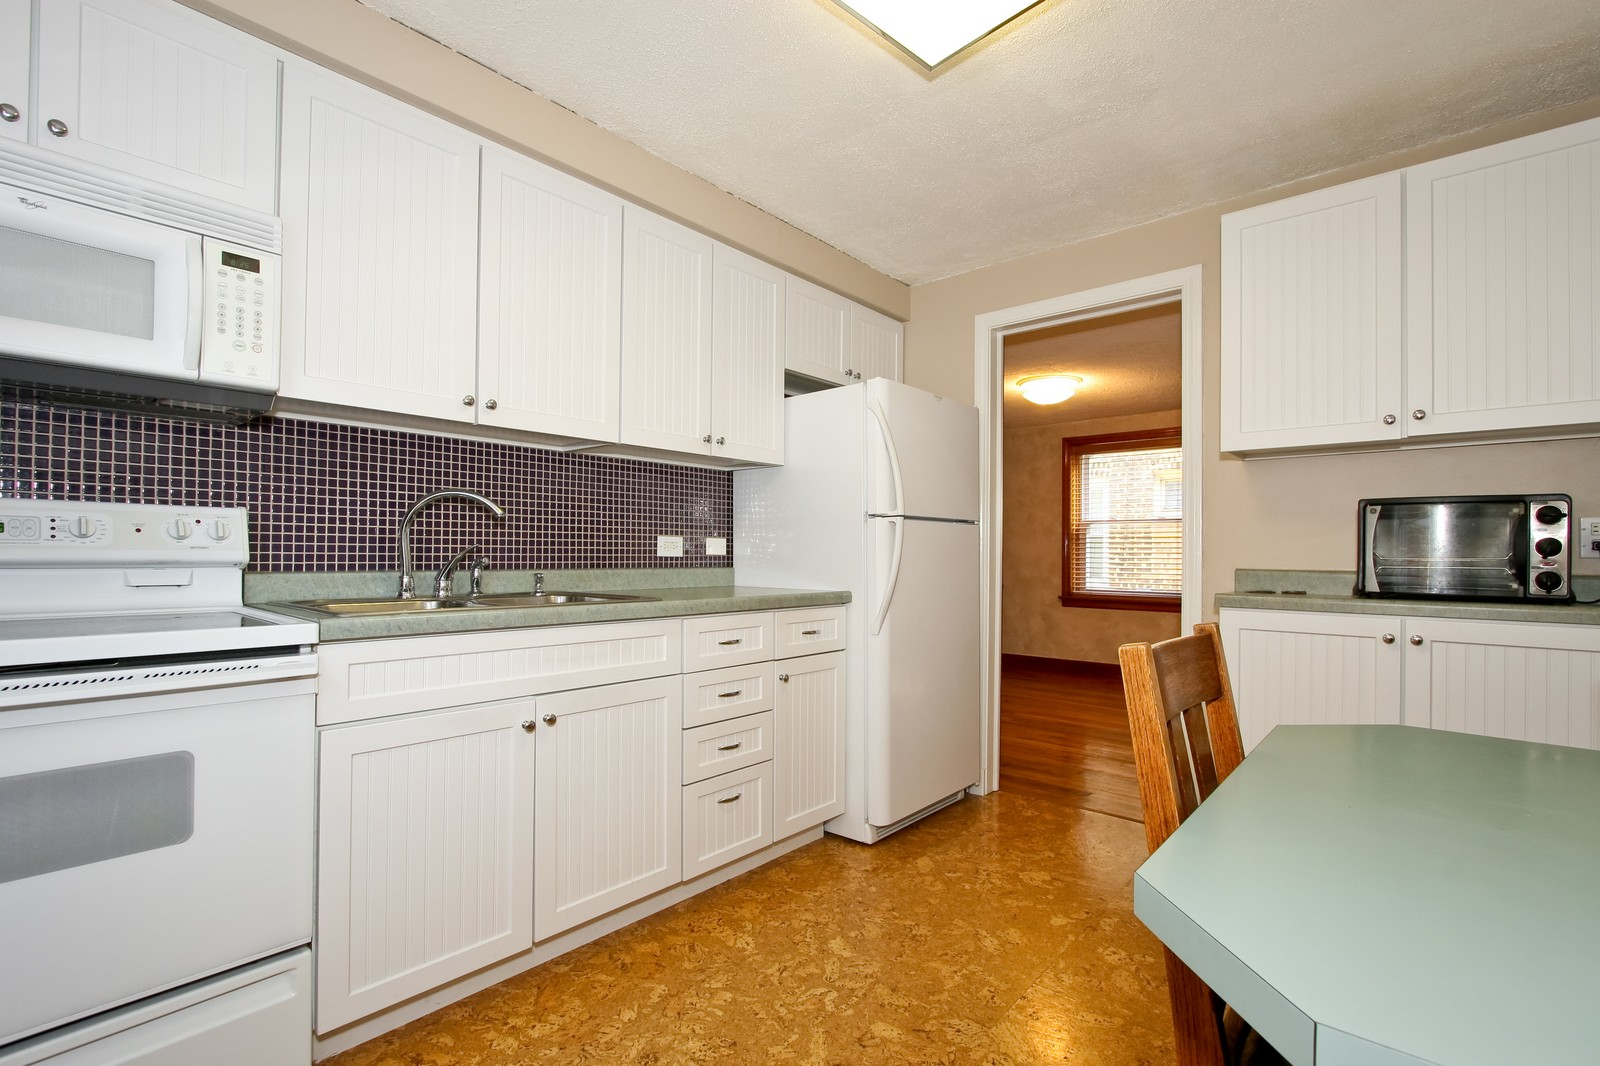 Real Estate Photography - 11246 S Avenue L, Chicago, IL, 60617 - Kitchen